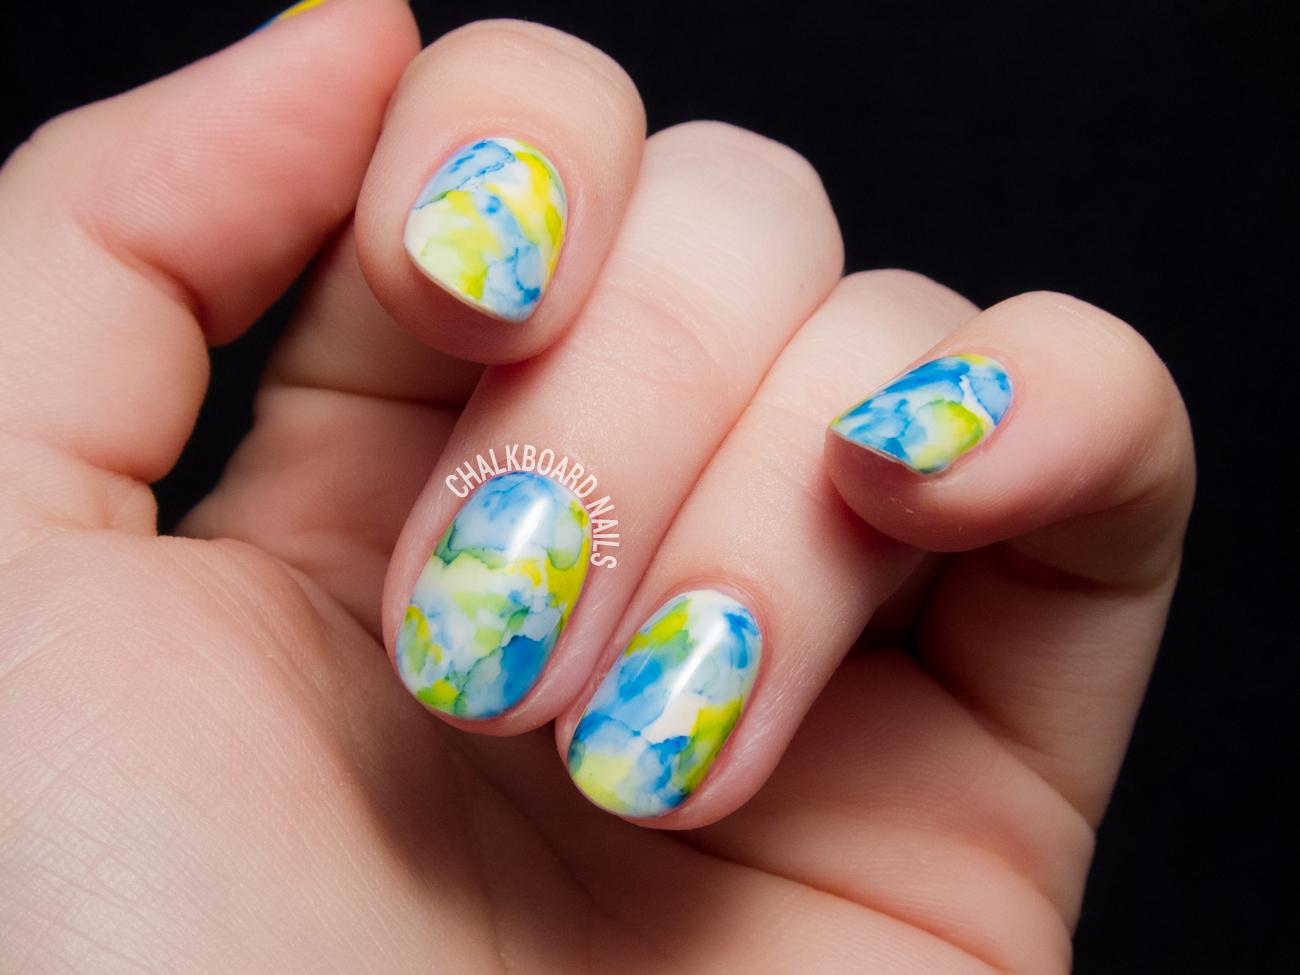 sharpie-marble-gel-nail-art-1